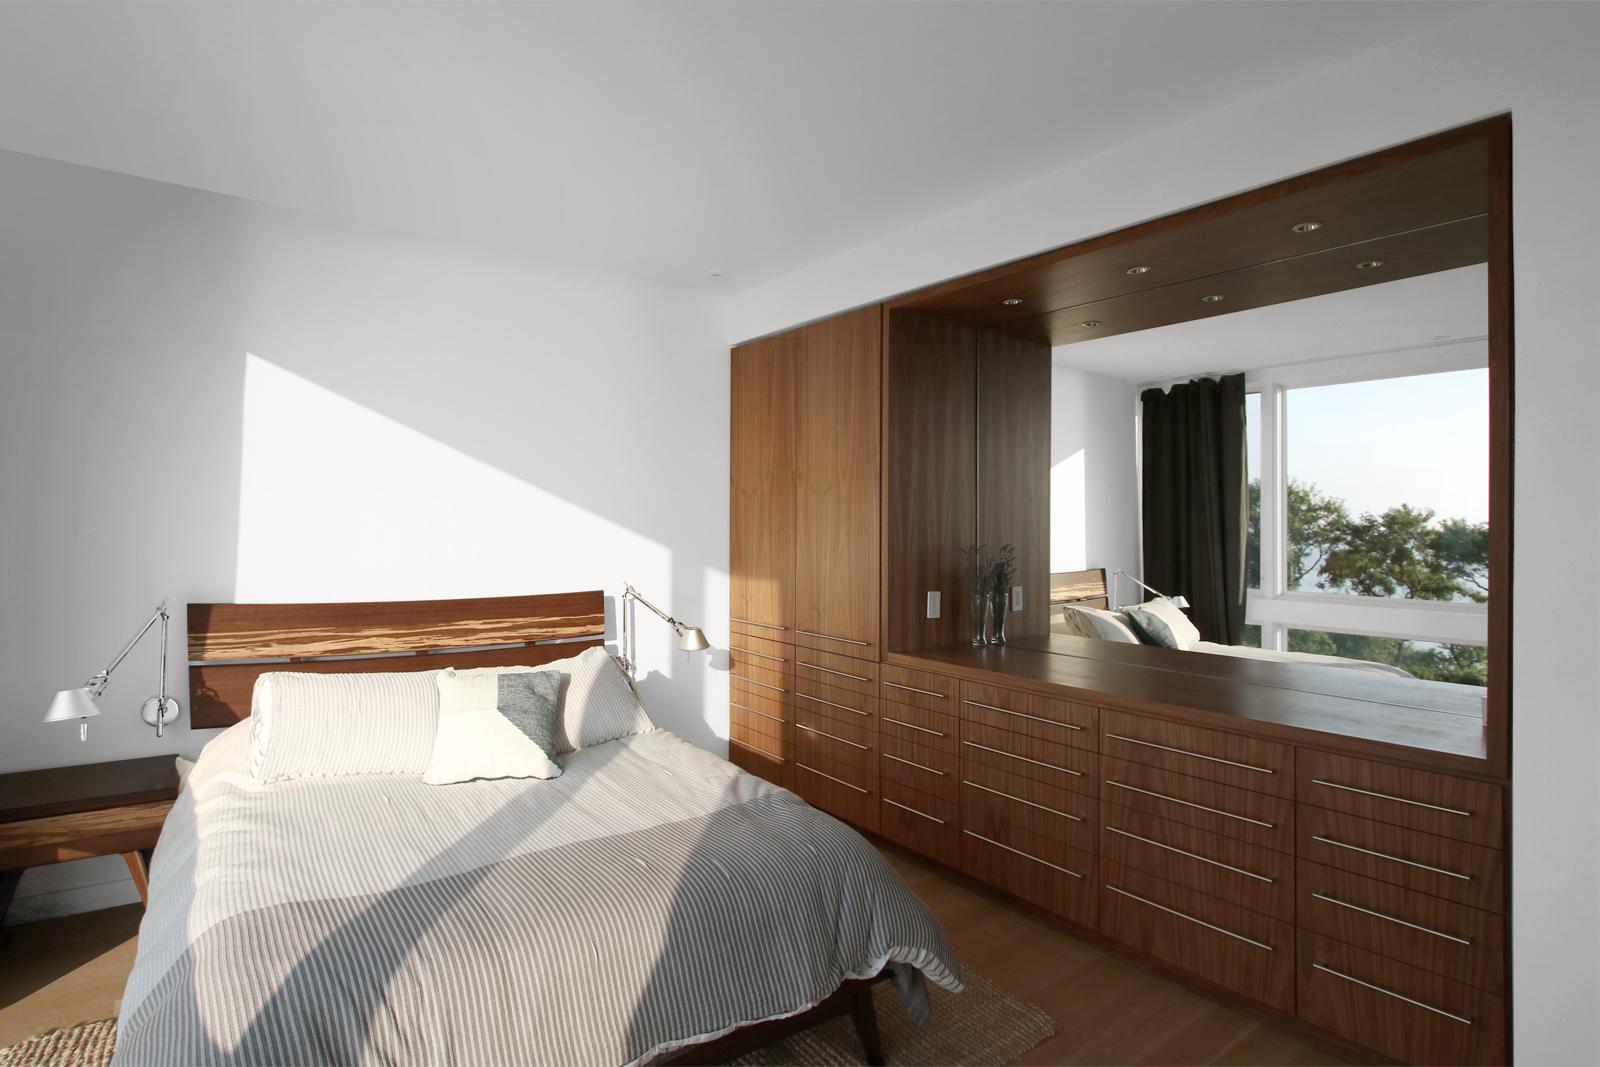 22-res4-resolution-4-architecture-modern-modular-house-prefab-home-north-fork-bluff-house-interior-bedroom-millwork.jpg